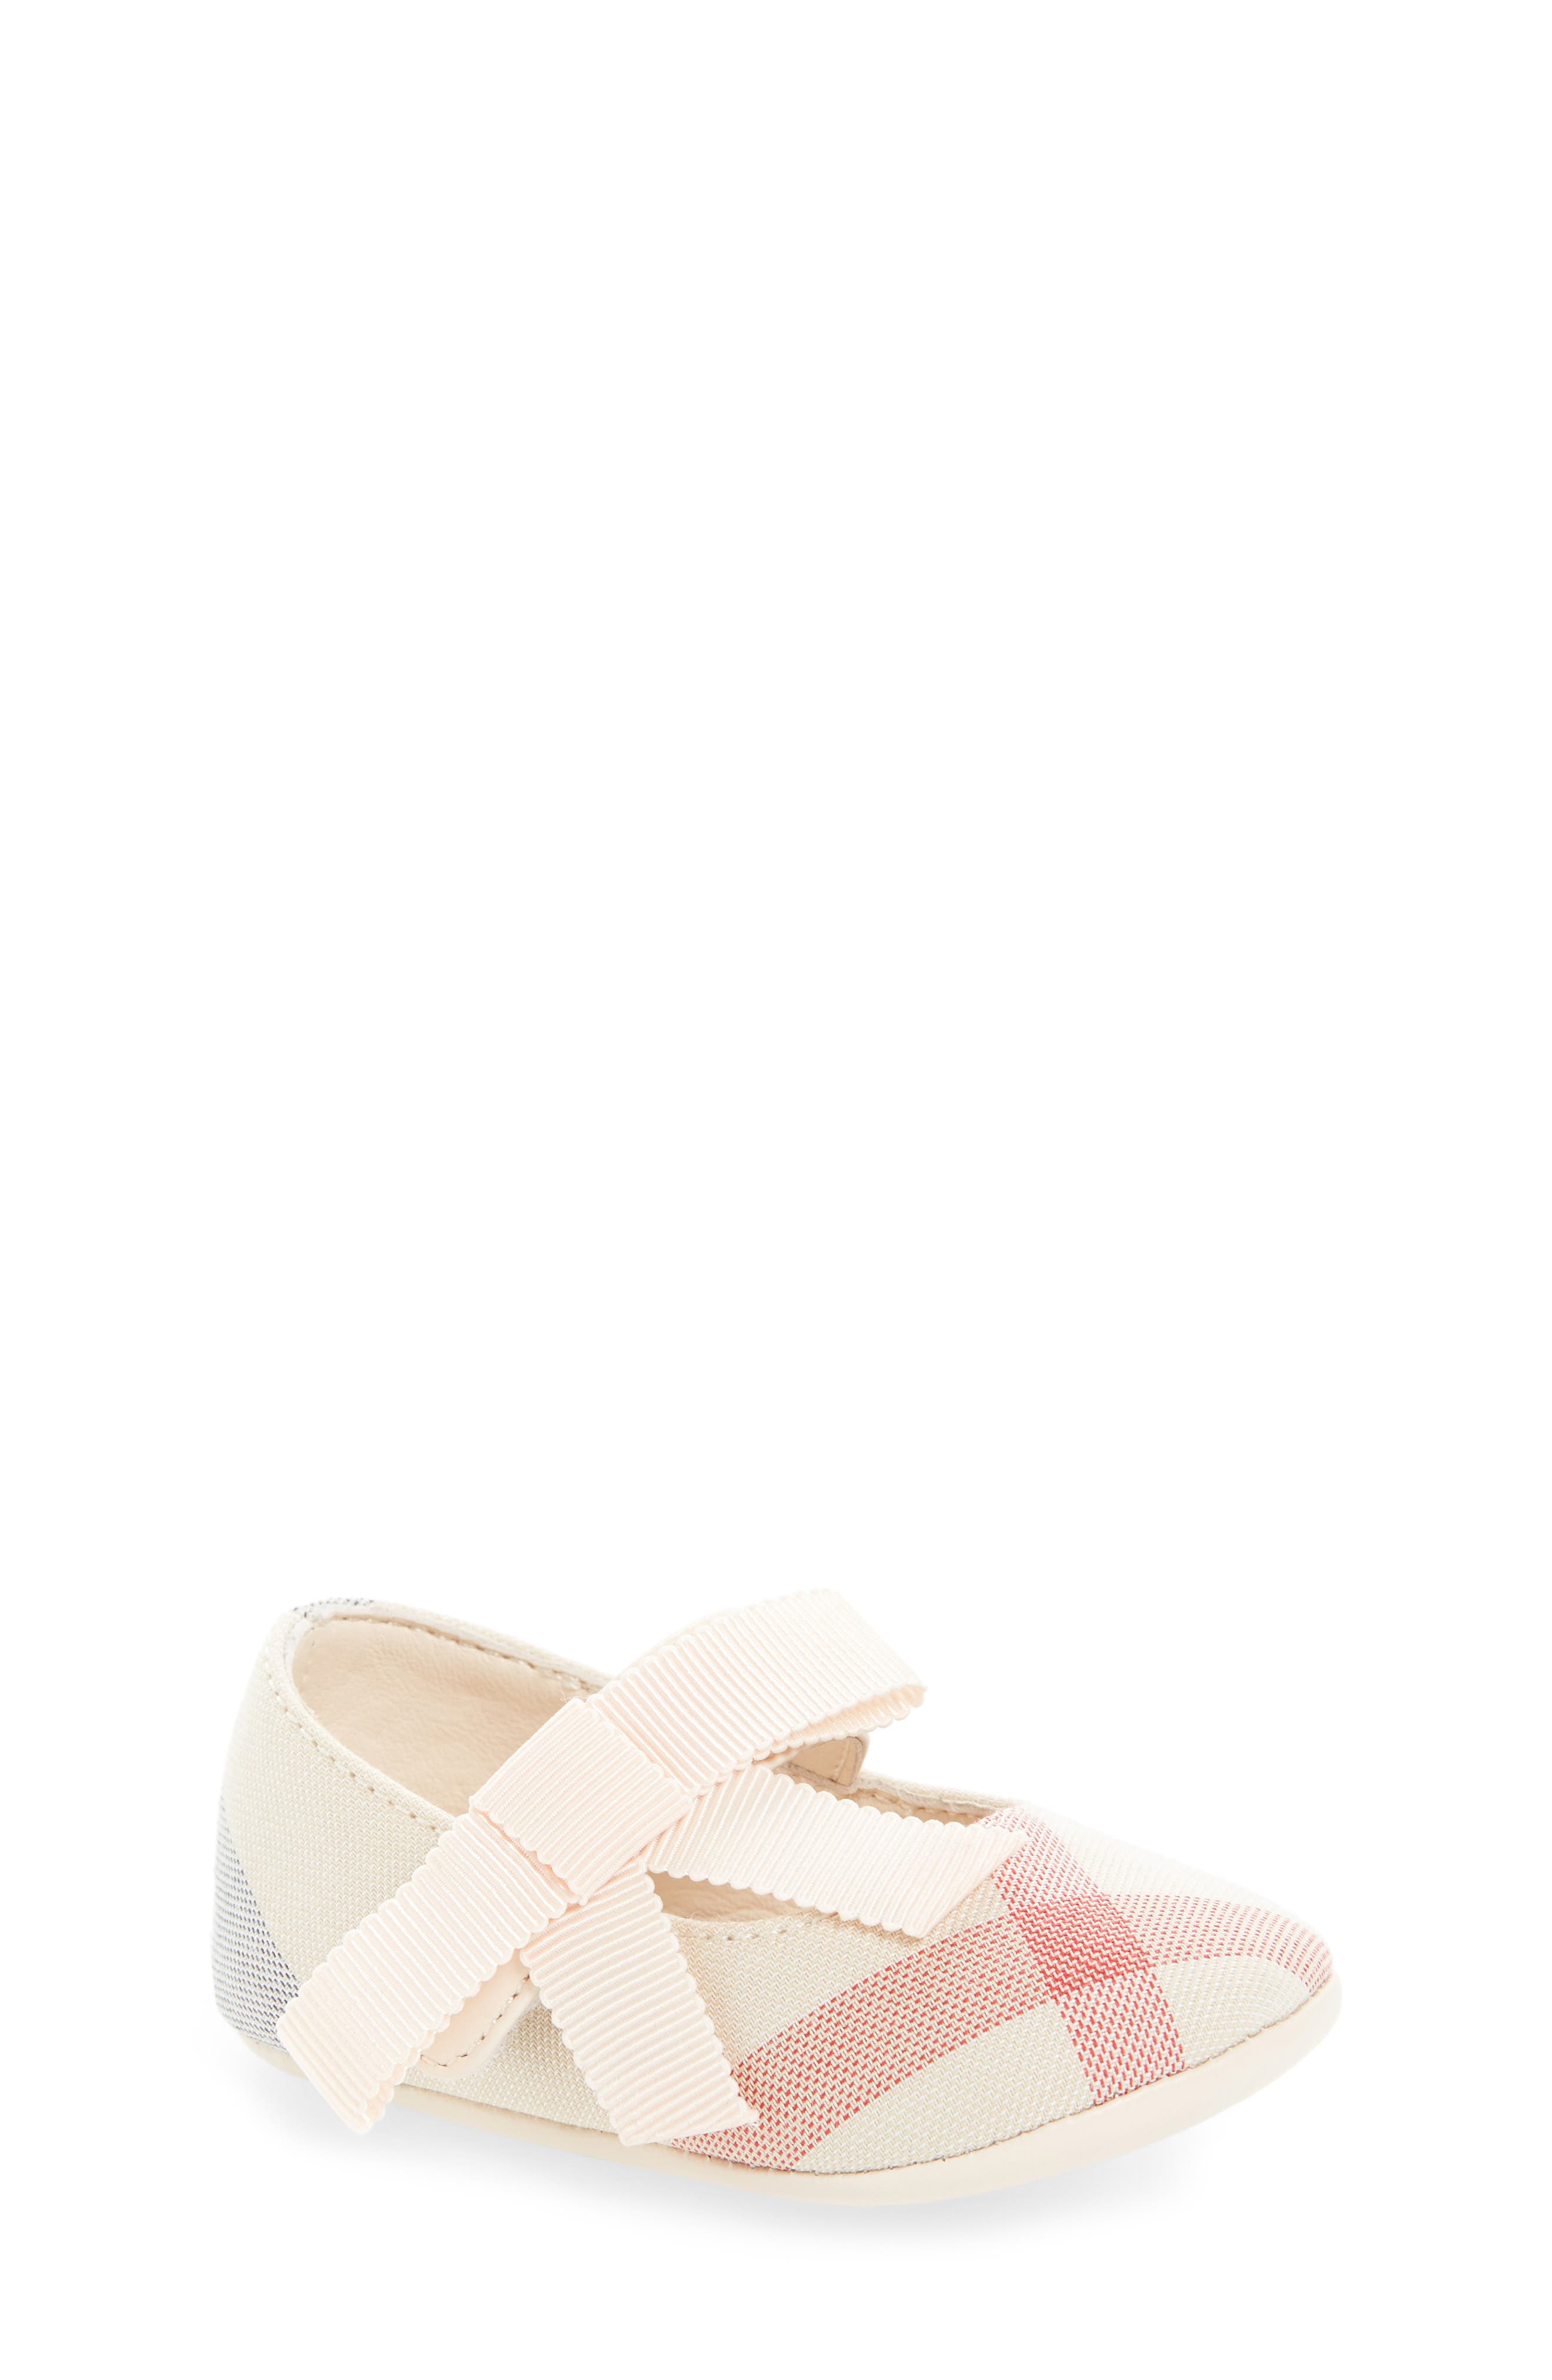 Stark Mary Jane Crib Shoe,                         Main,                         color, 250